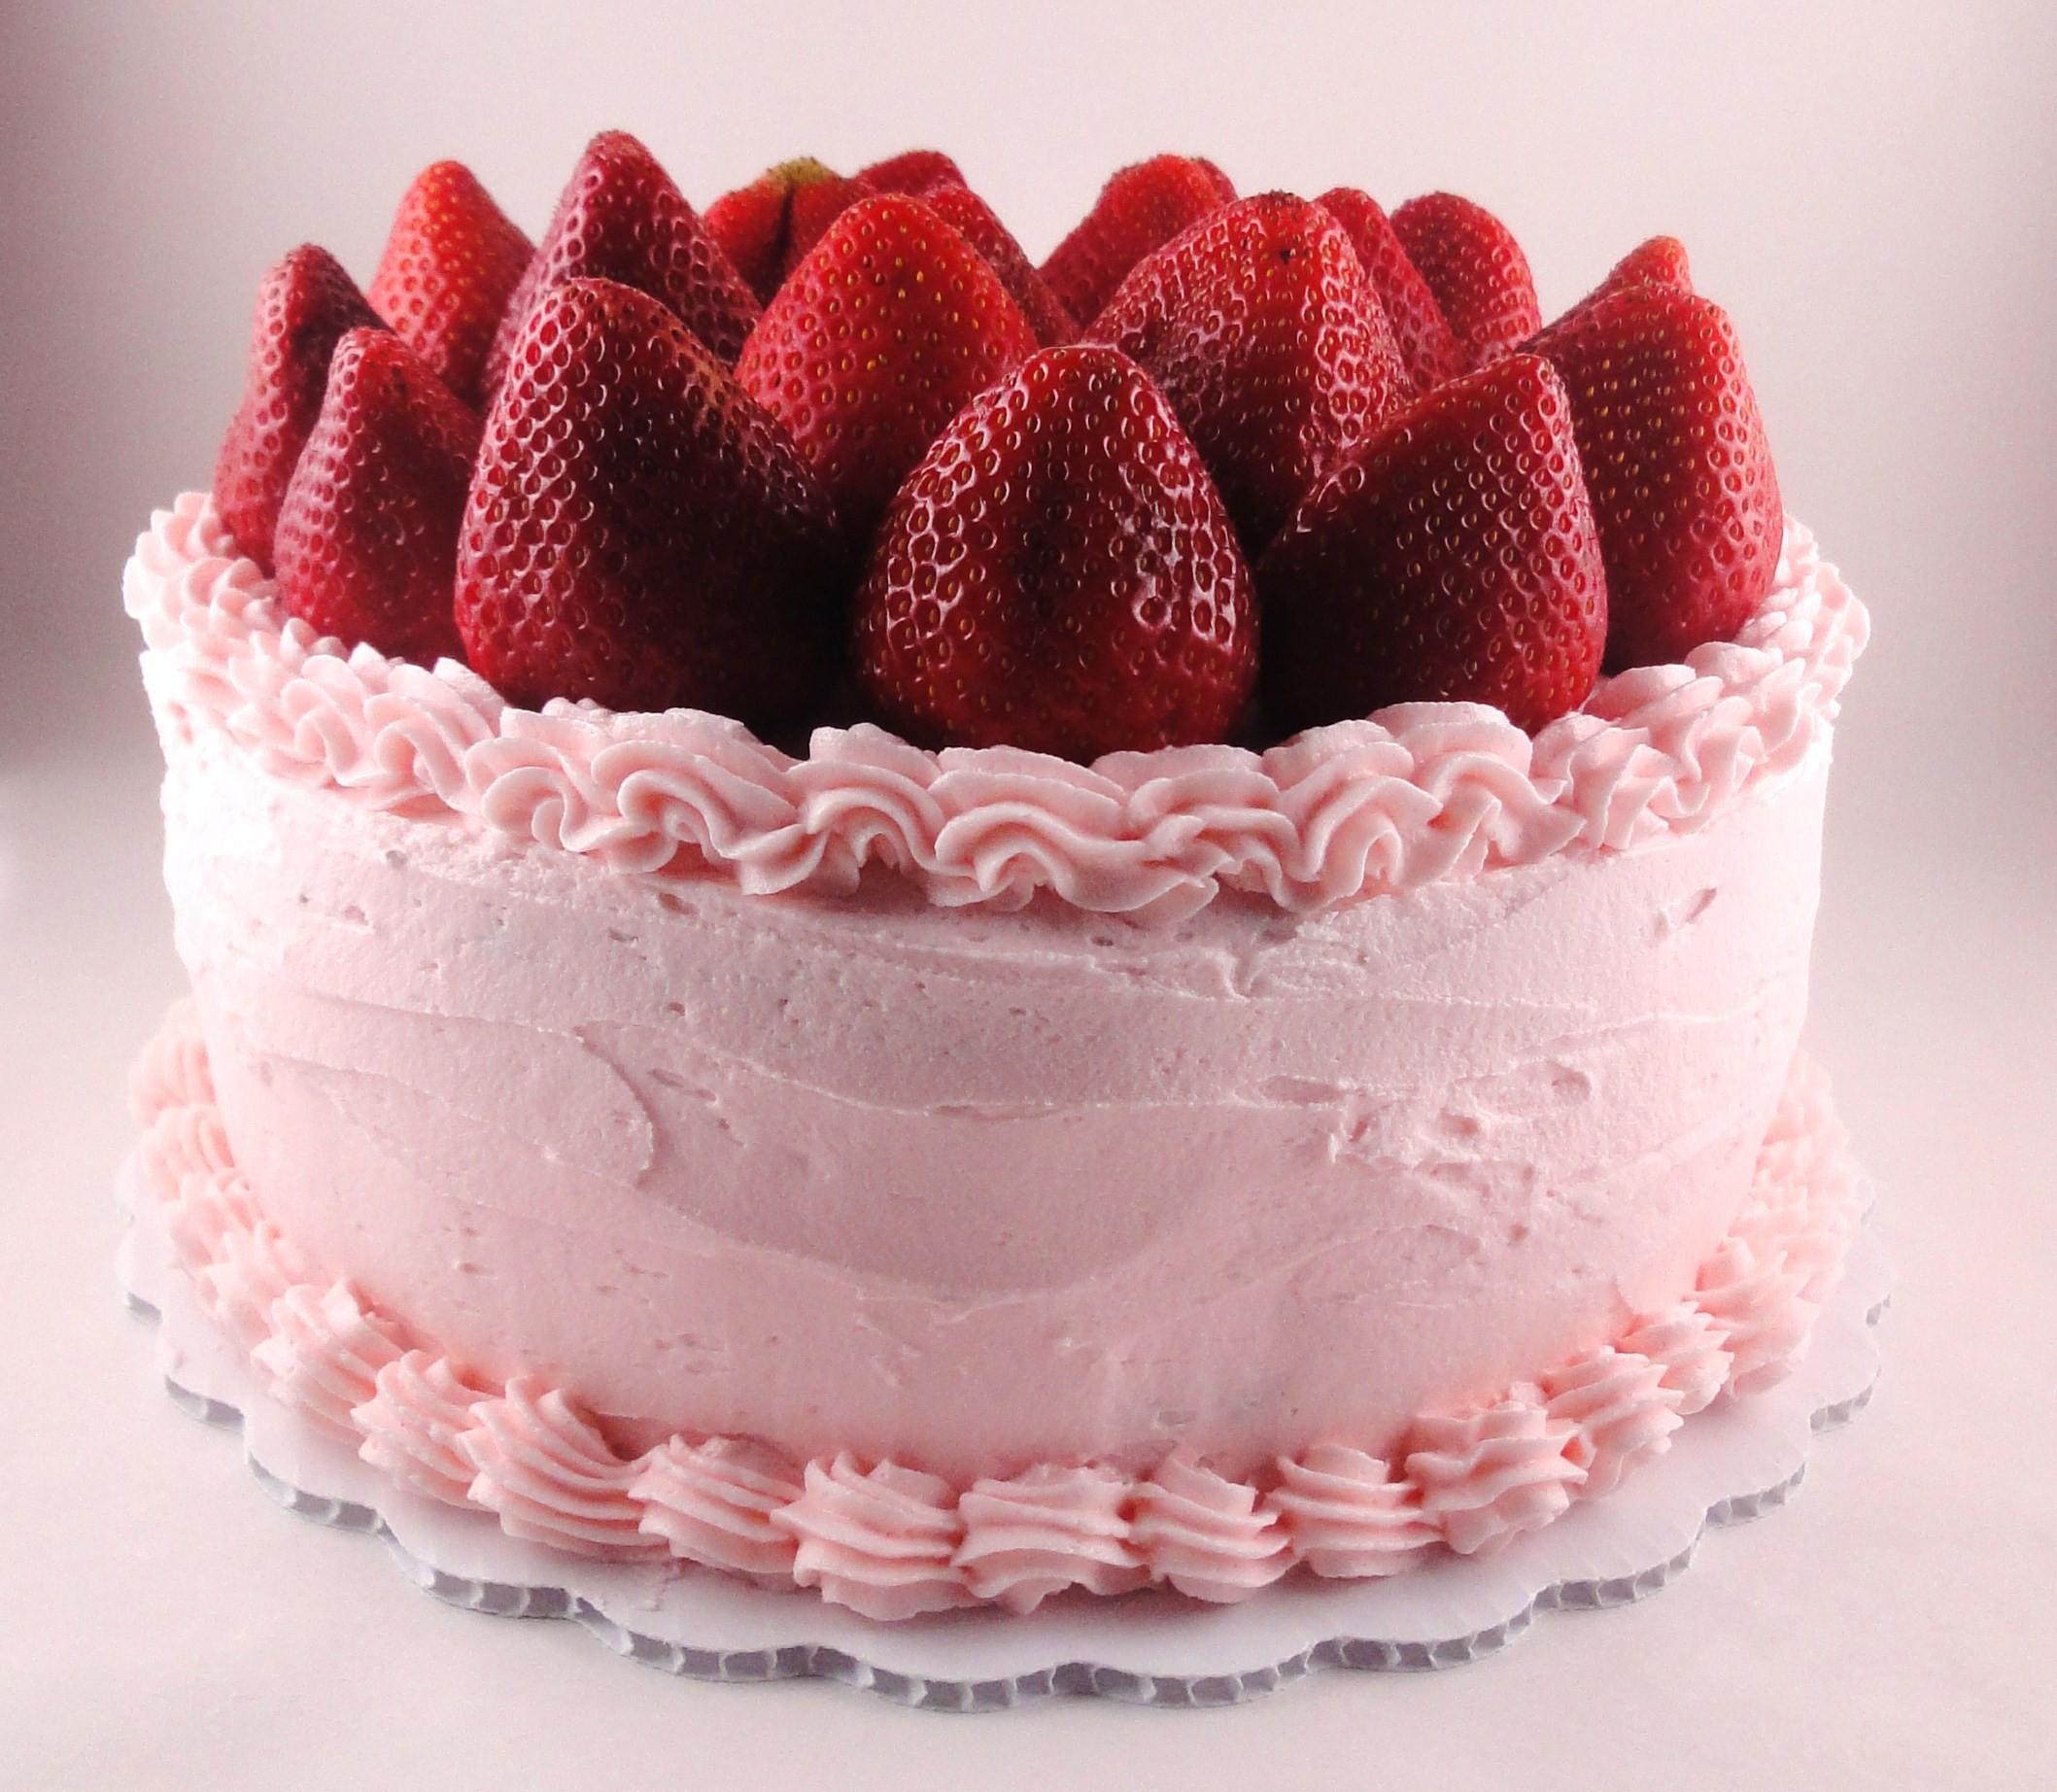 Strawberry Birthday Cake  Cake With Strawberries Wallpaper